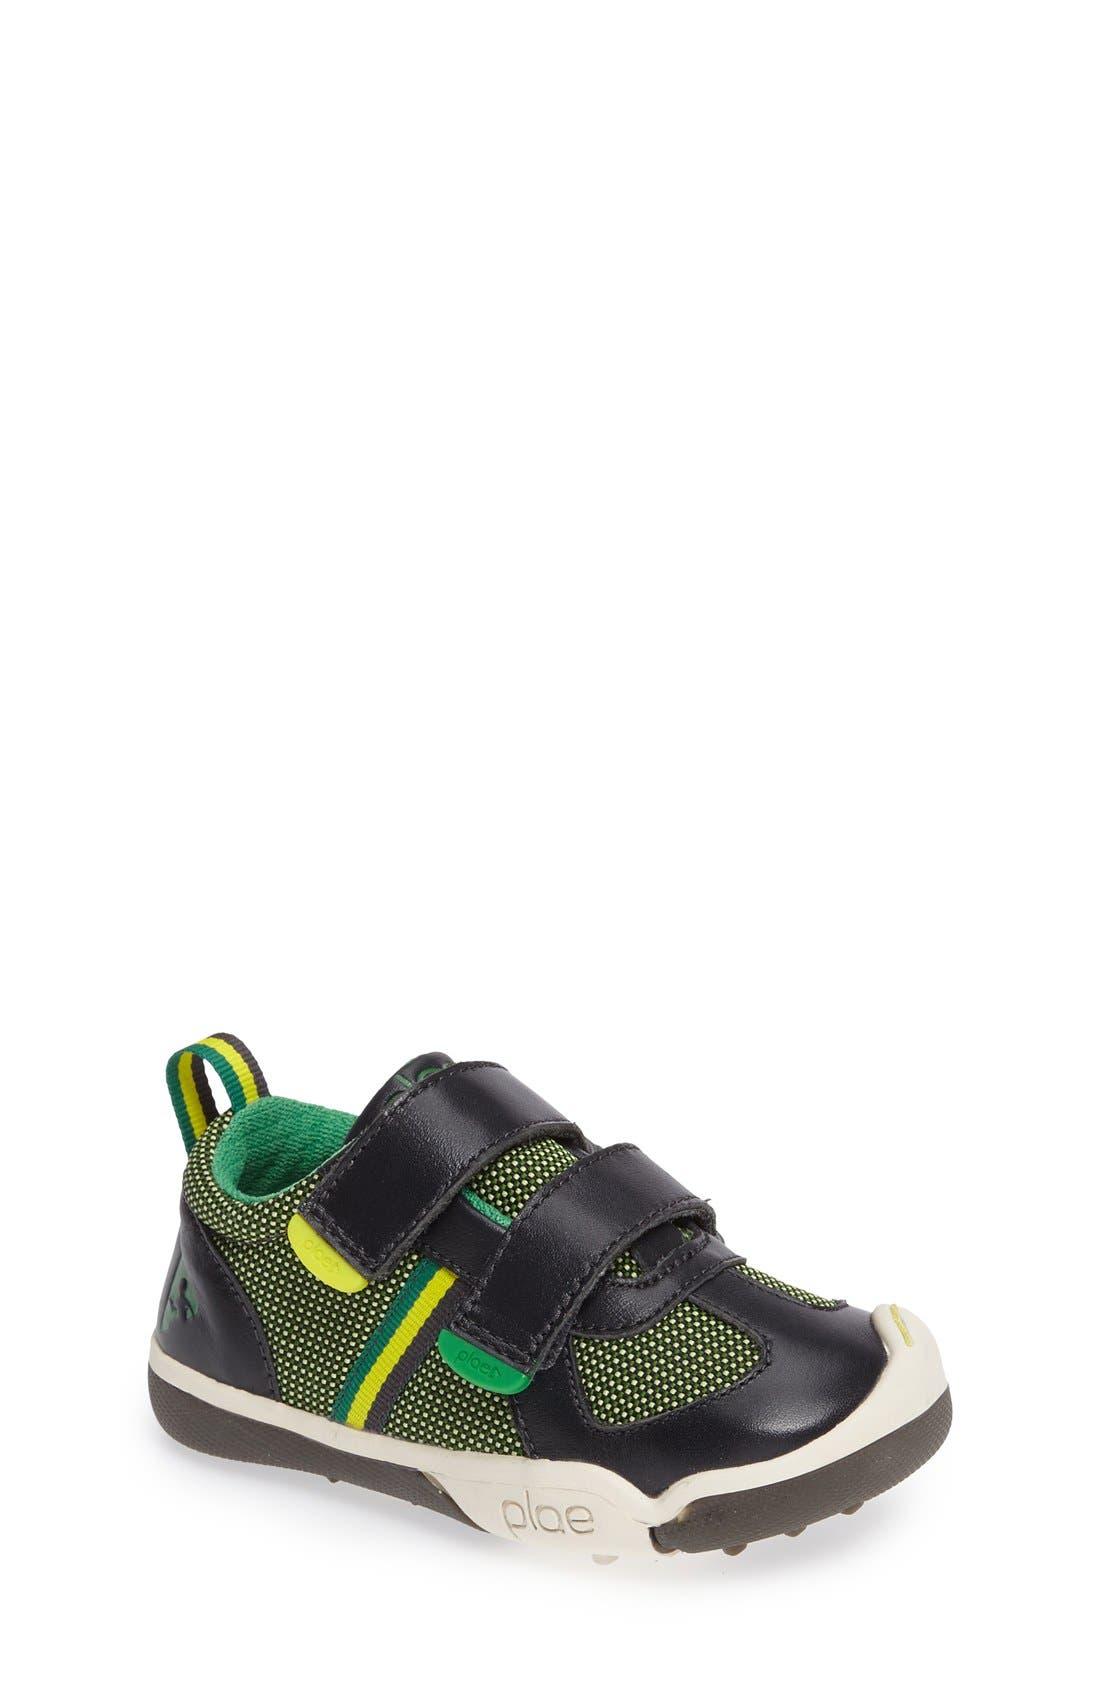 PLAE Charlie Customizable Sneaker (Toddler, Little Kid & Big Kid)